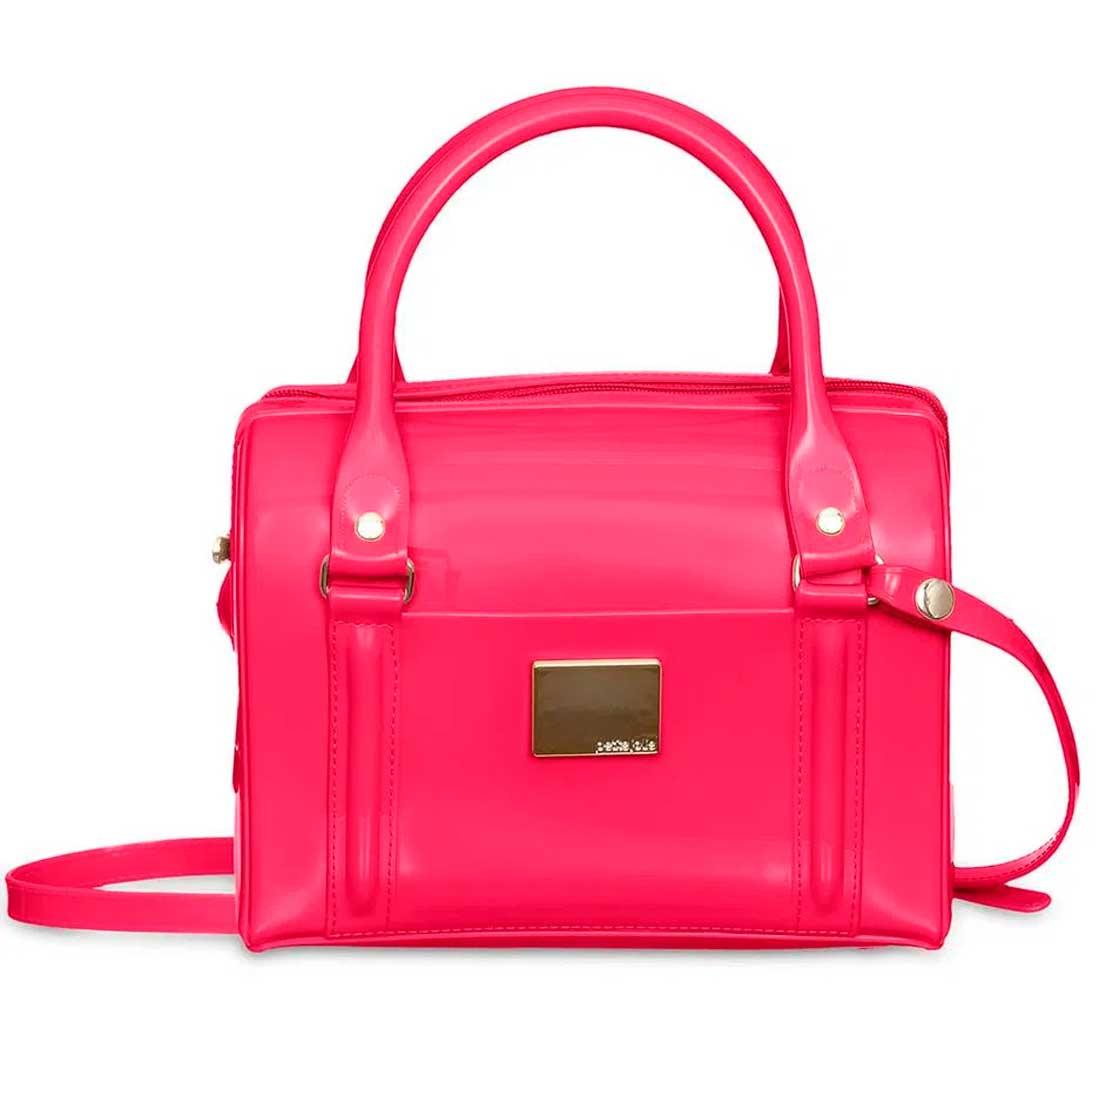 Bolsa Petite Jolie Lana - New Pink